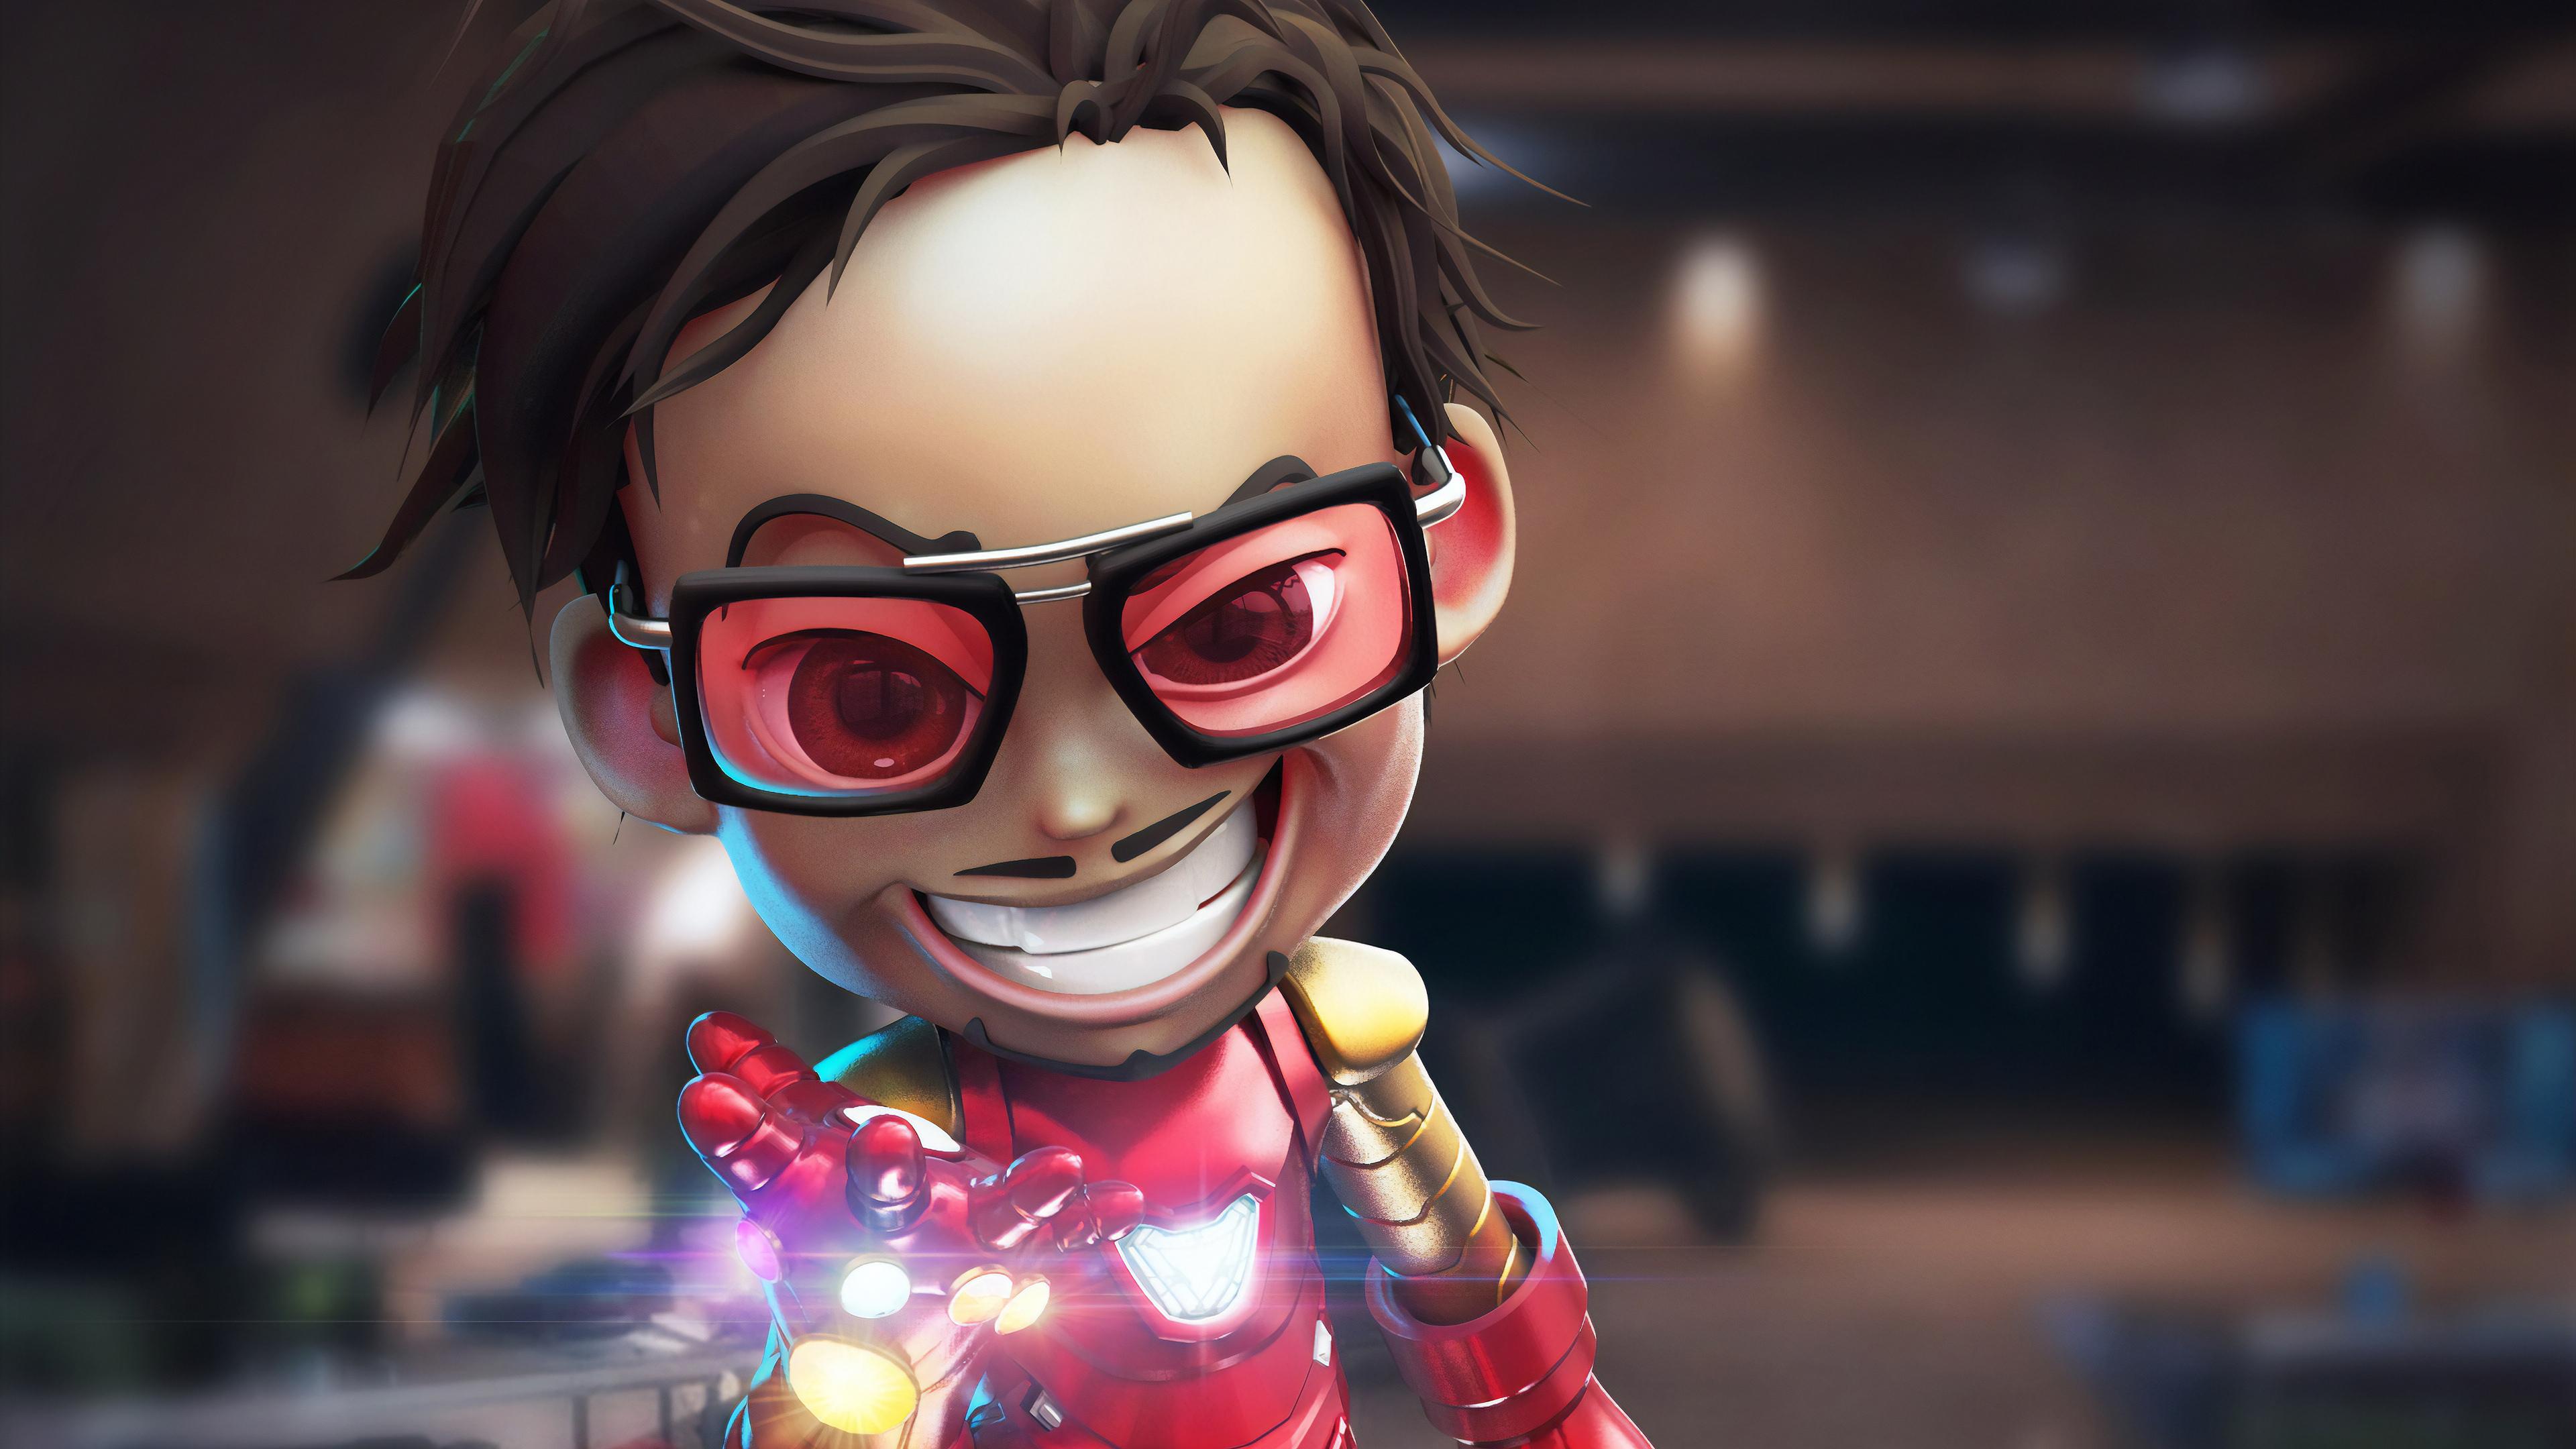 kid iron man 1562104957 - Kid Iron Man - superheroes wallpapers, iron man wallpapers, hd-wallpapers, digital art wallpapers, behance wallpapers, artwork wallpapers, 4k-wallpapers